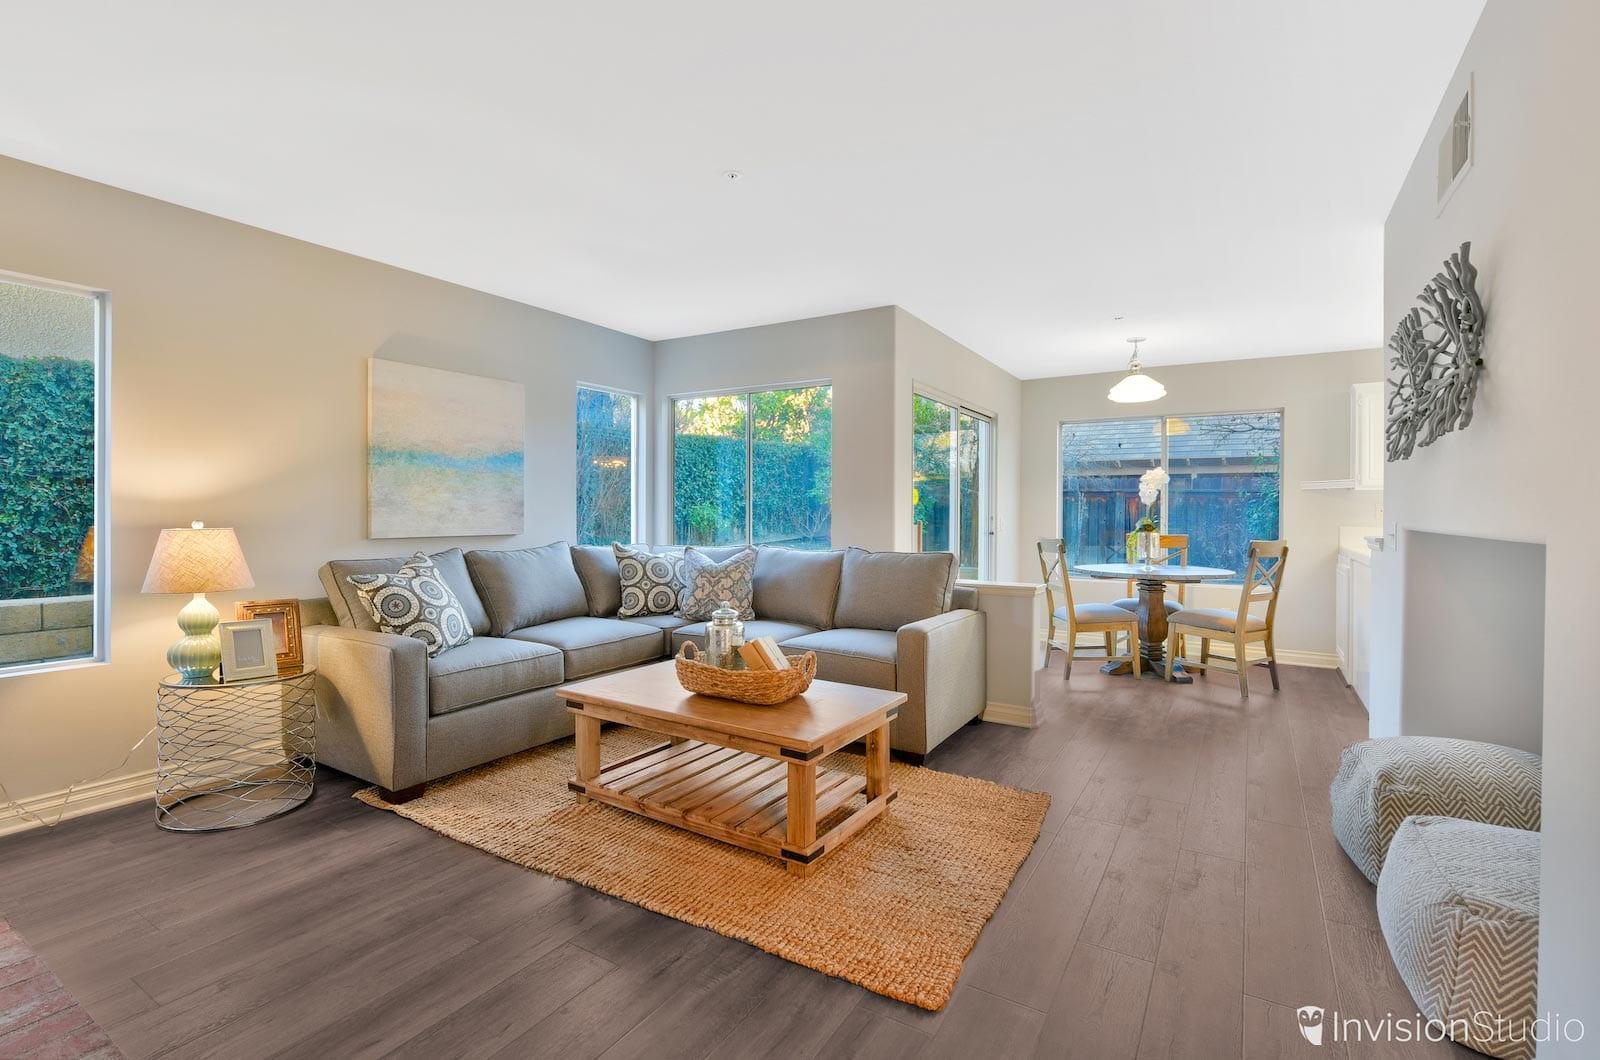 Living Room 1 | Orange County HDR Real Estate Photographer | Orange County Virtual Tour Photographer